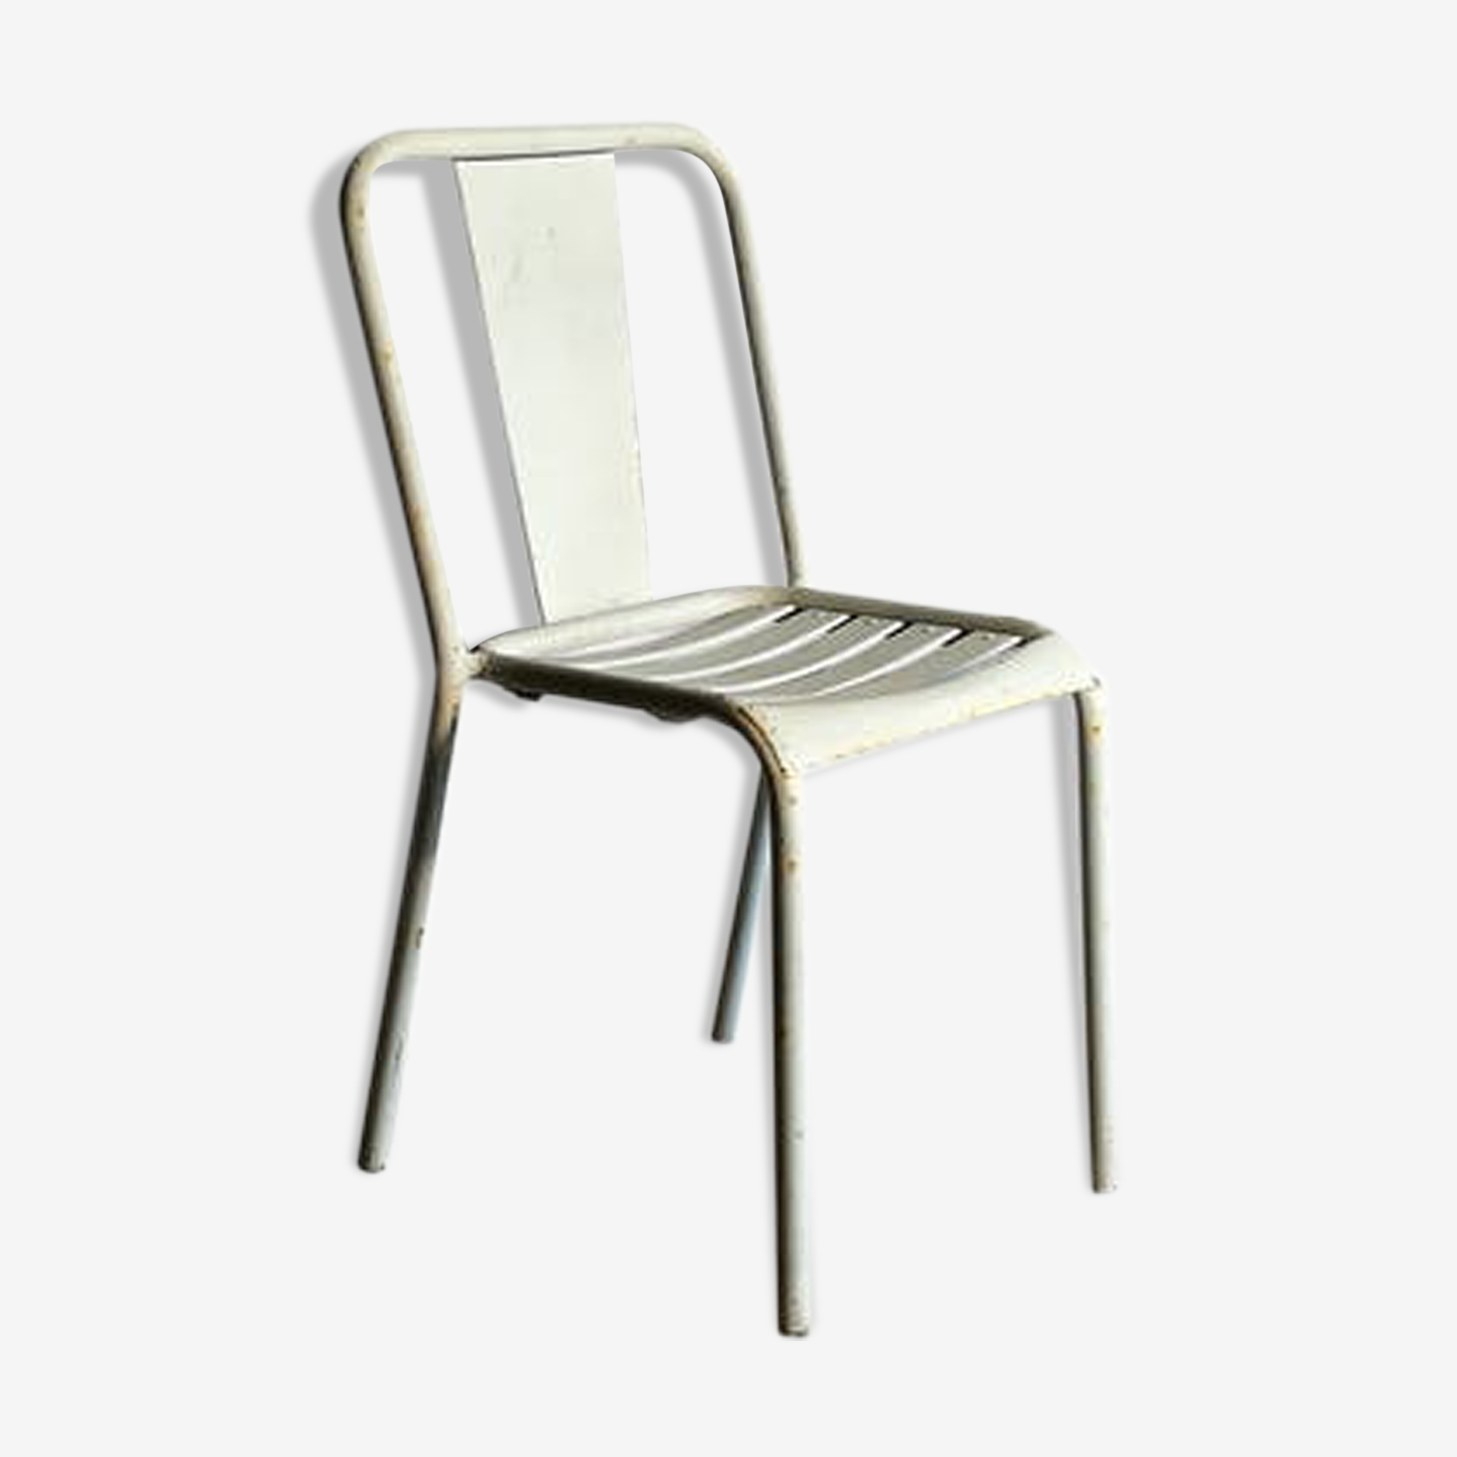 Chaise métal tolix T4 de Xavier Pauchard